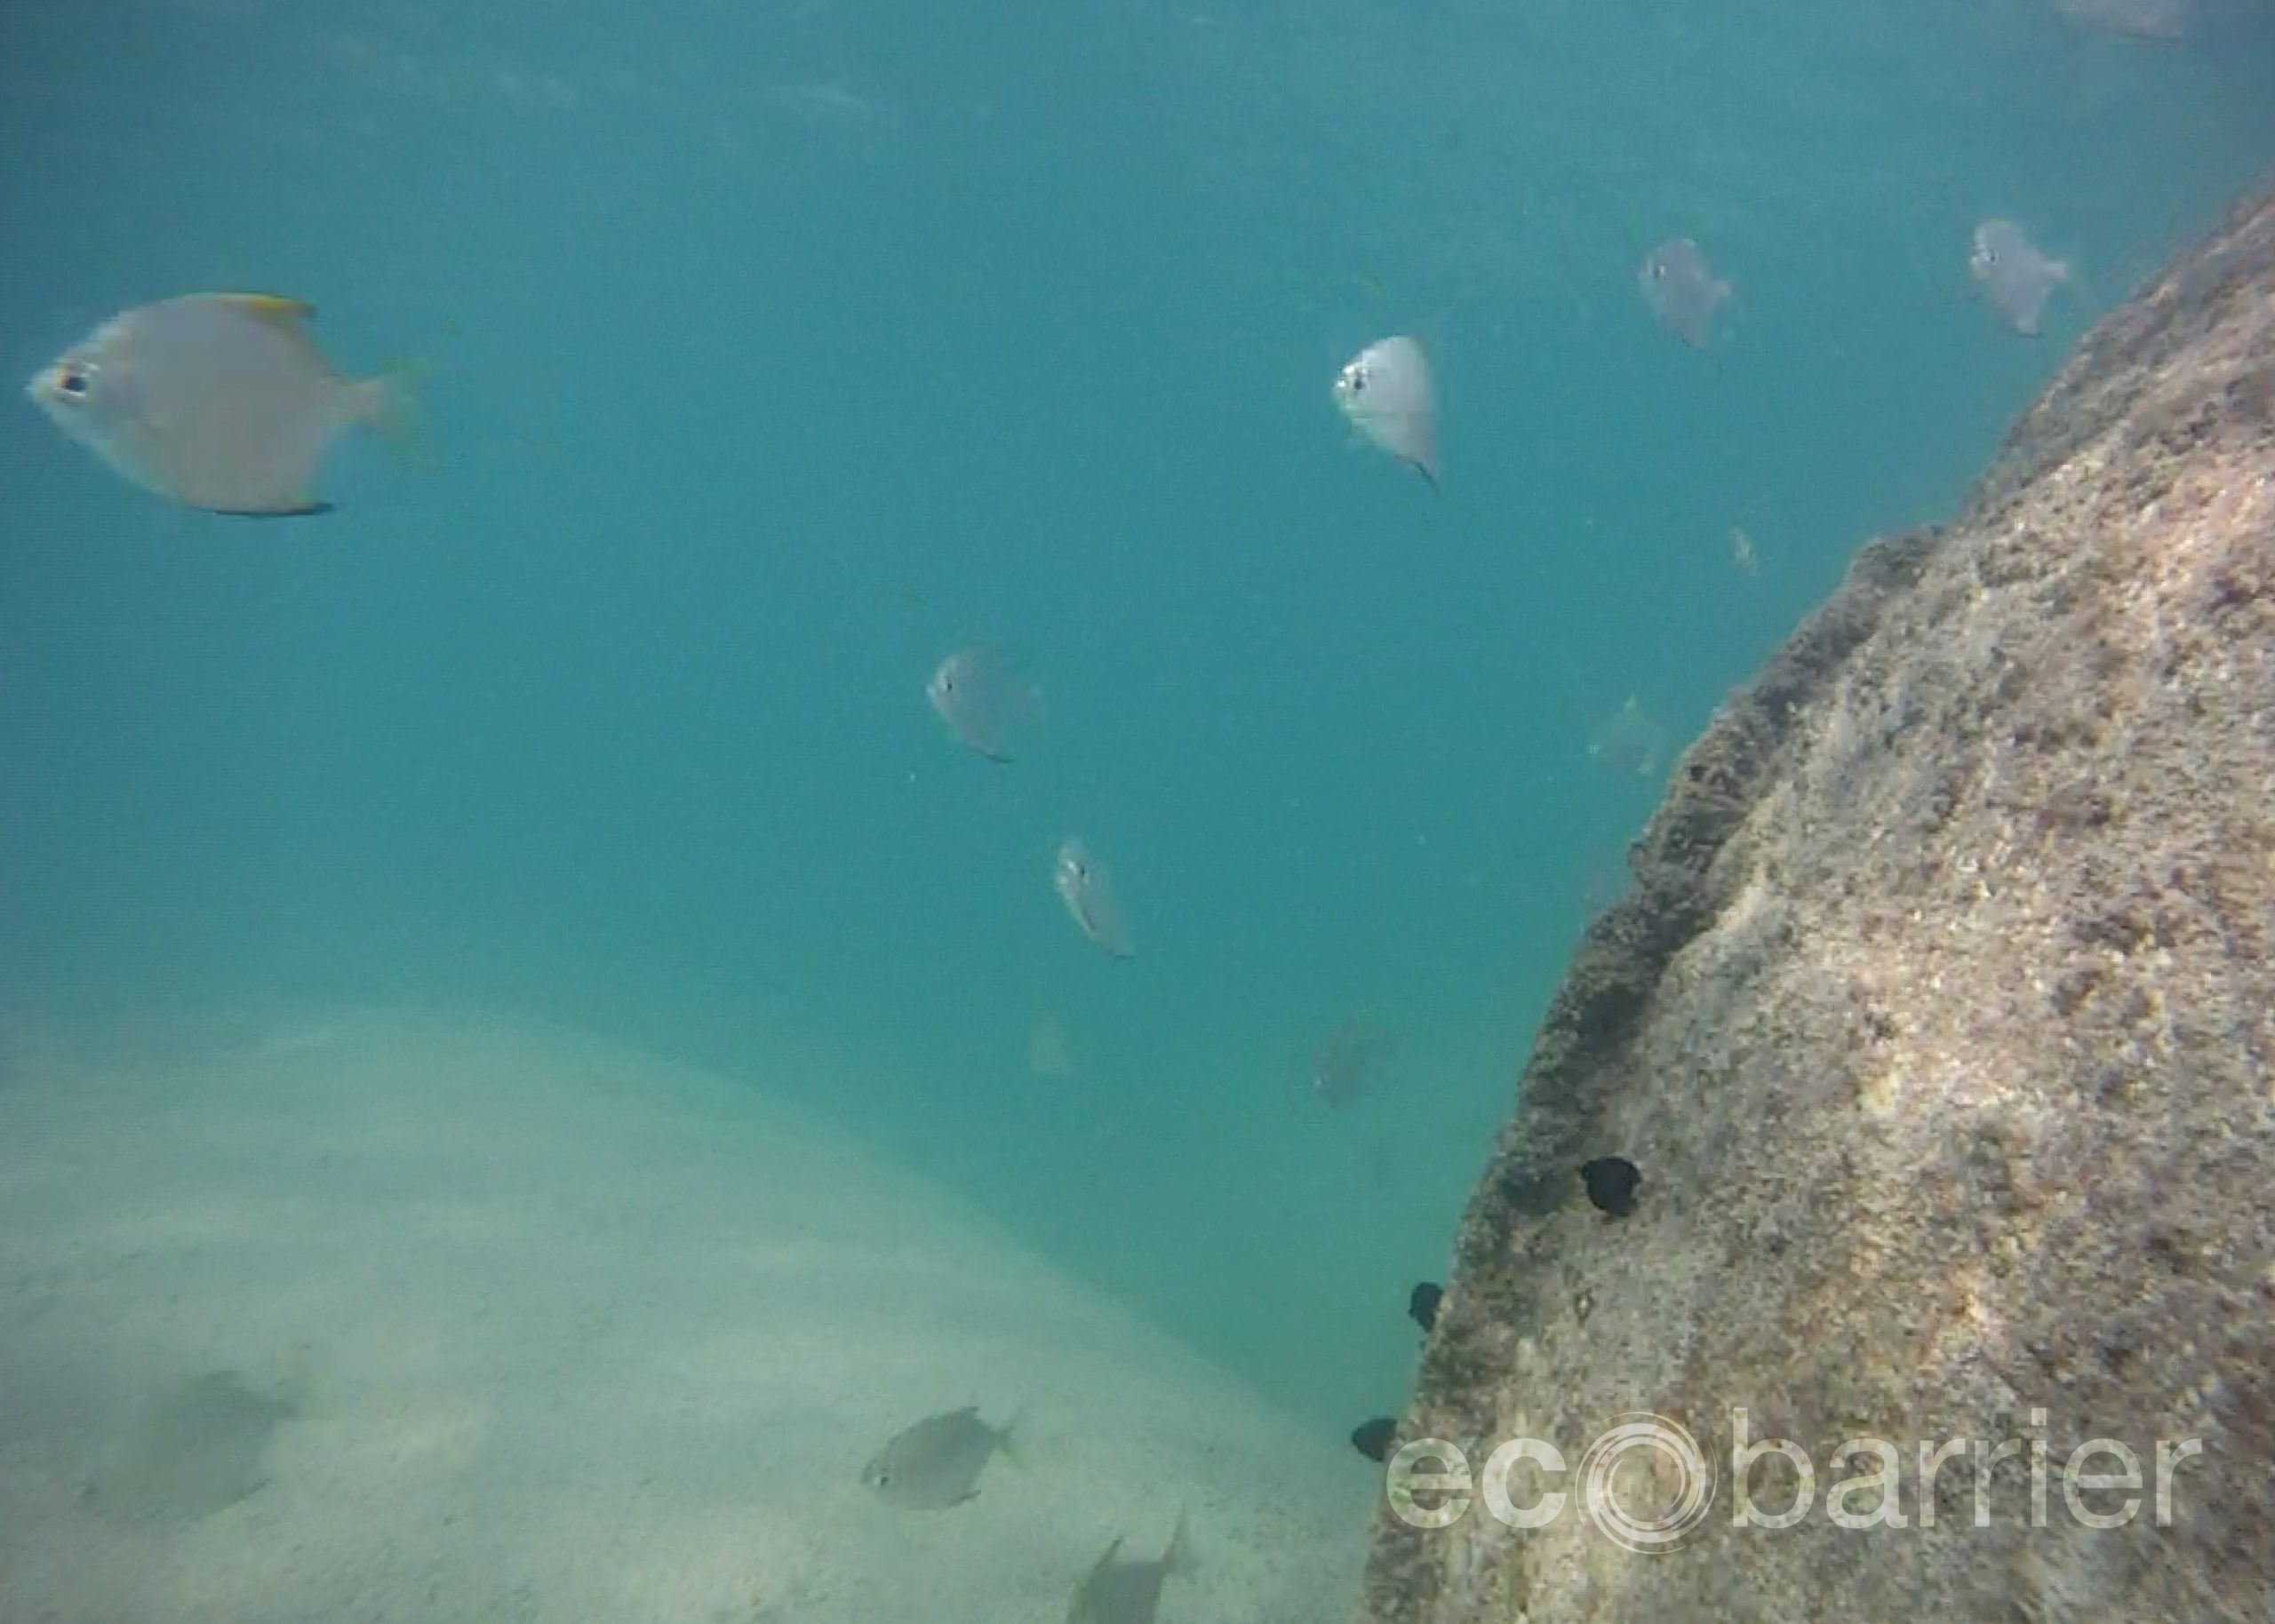 Ecotubes - Marine Life - A Bit of Local Sustainability